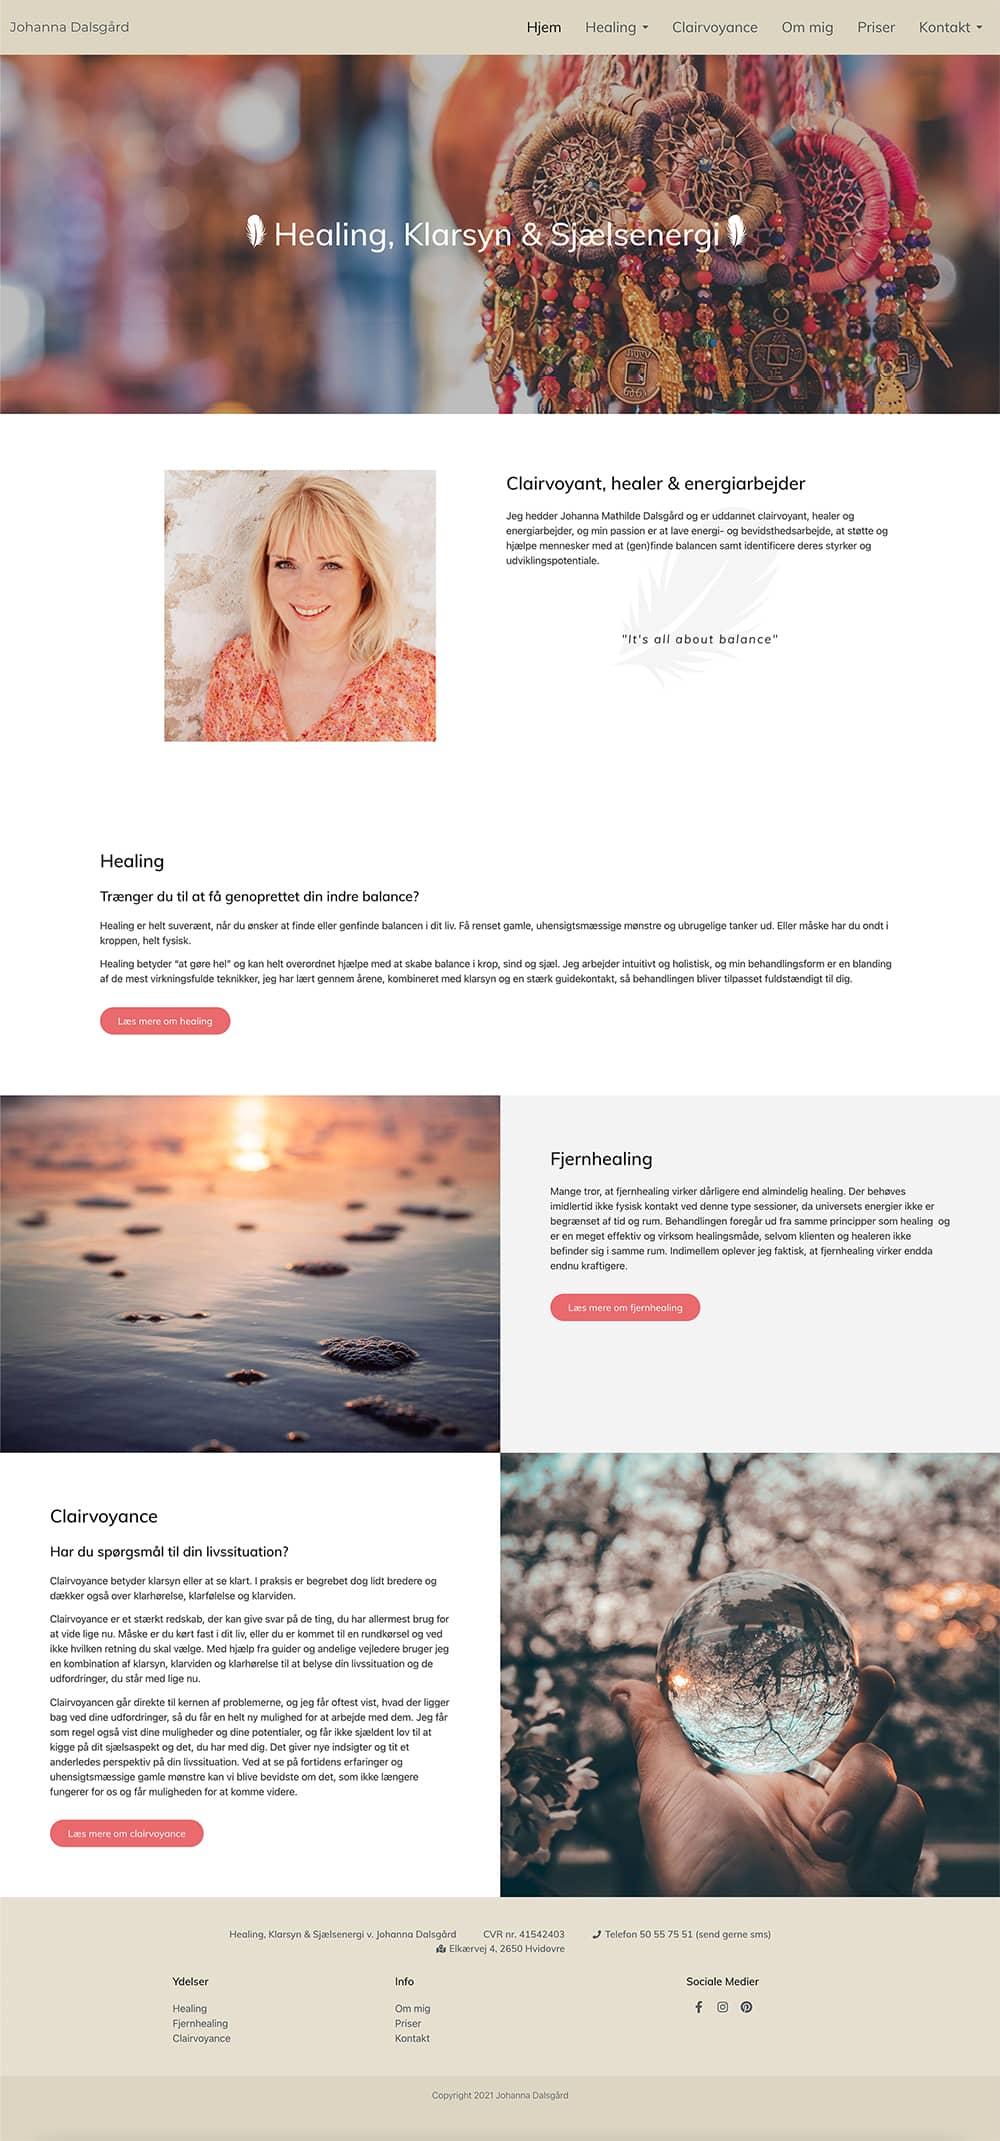 Johannadalsgard Website3 Compressed 1